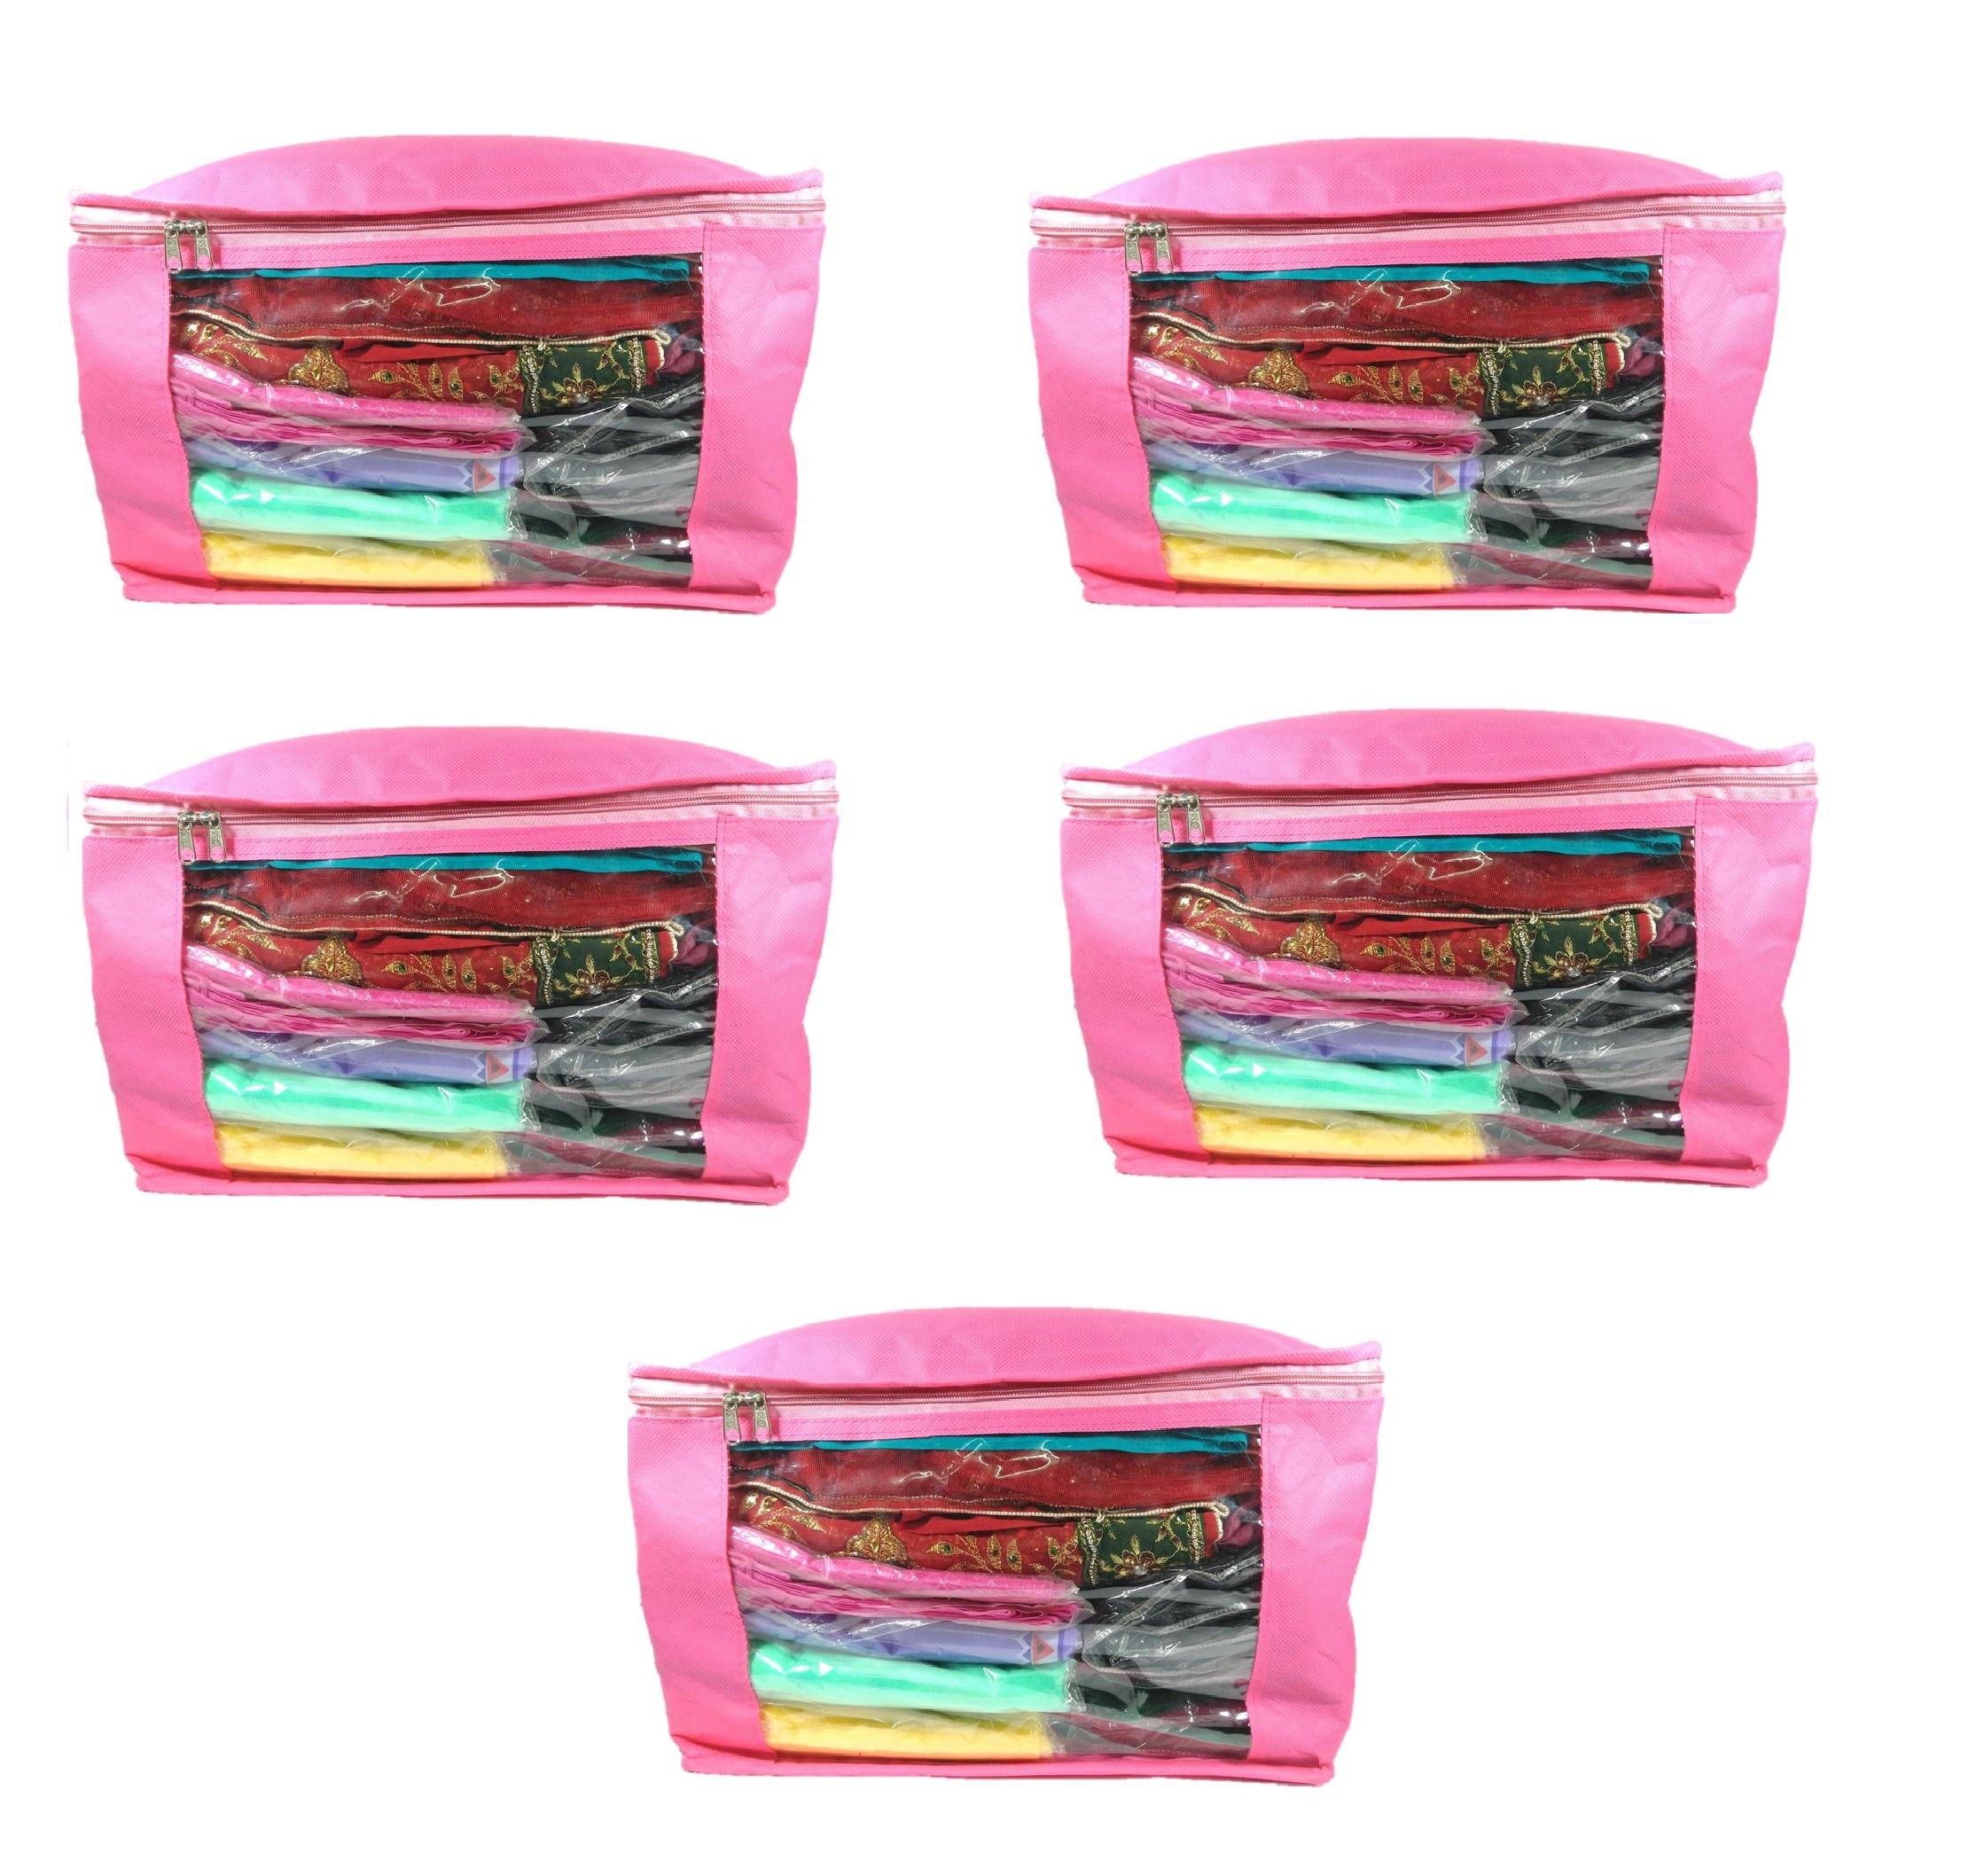 ADWITIYA Plain 10 Inch Ladies Large Non   Woven 5 Saree Cover Keep Upto 10   15 Sarees each  Pink